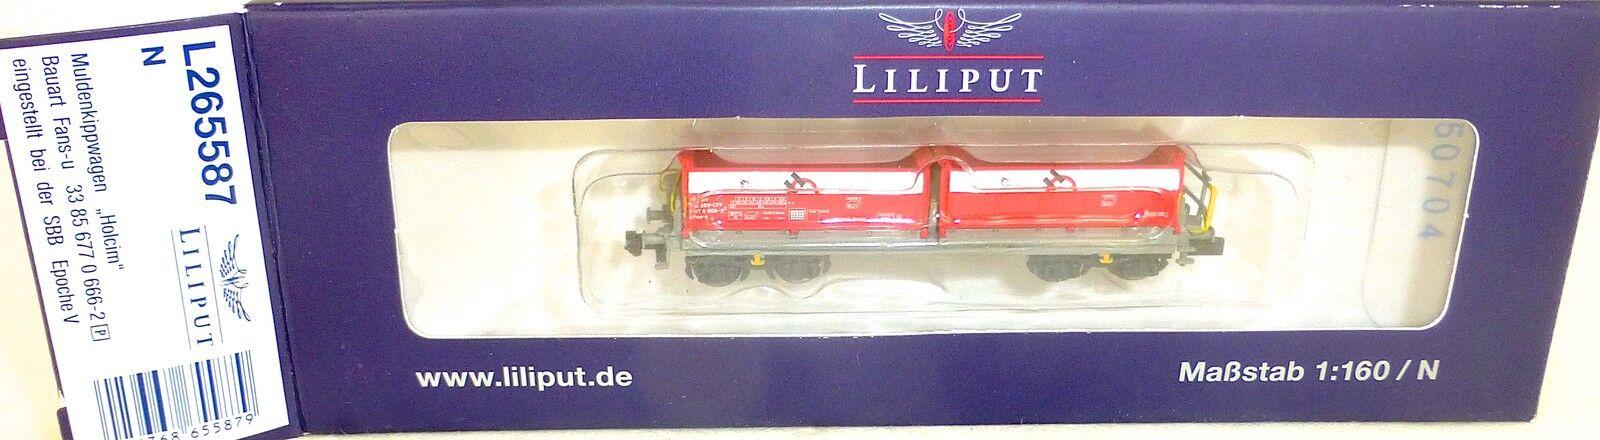 SBB tifosi U pozzetti Kipp carrello schüttwagen EPV Liliput l265587 NUOVO 1:160 N hs2 Å *